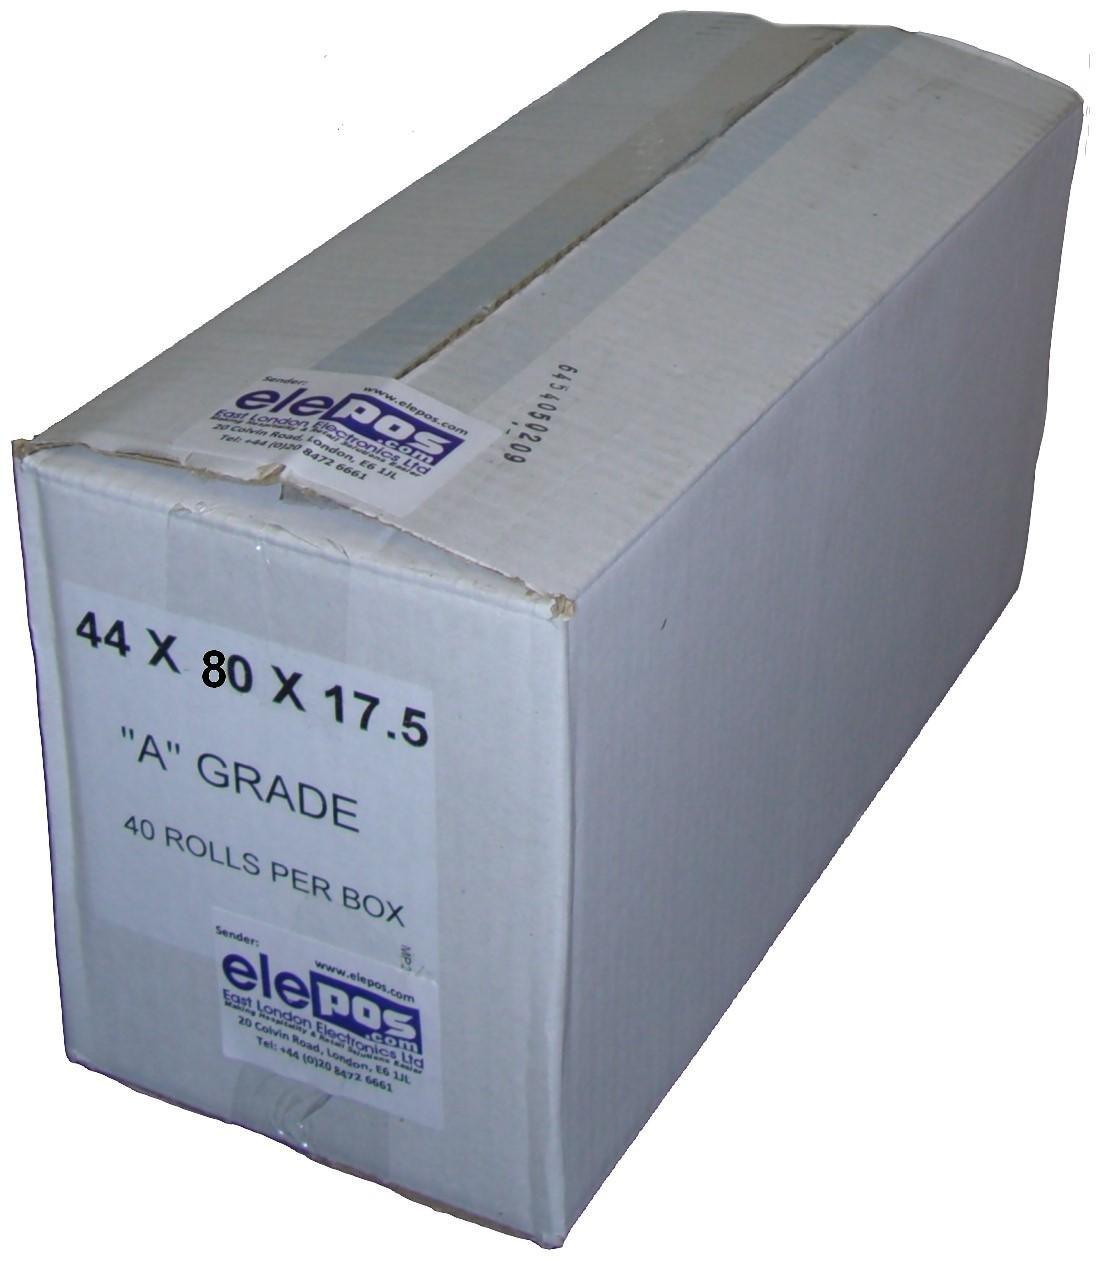 44 mm x 80 mm A Grade Till Rolls (40 Rolls) Generic